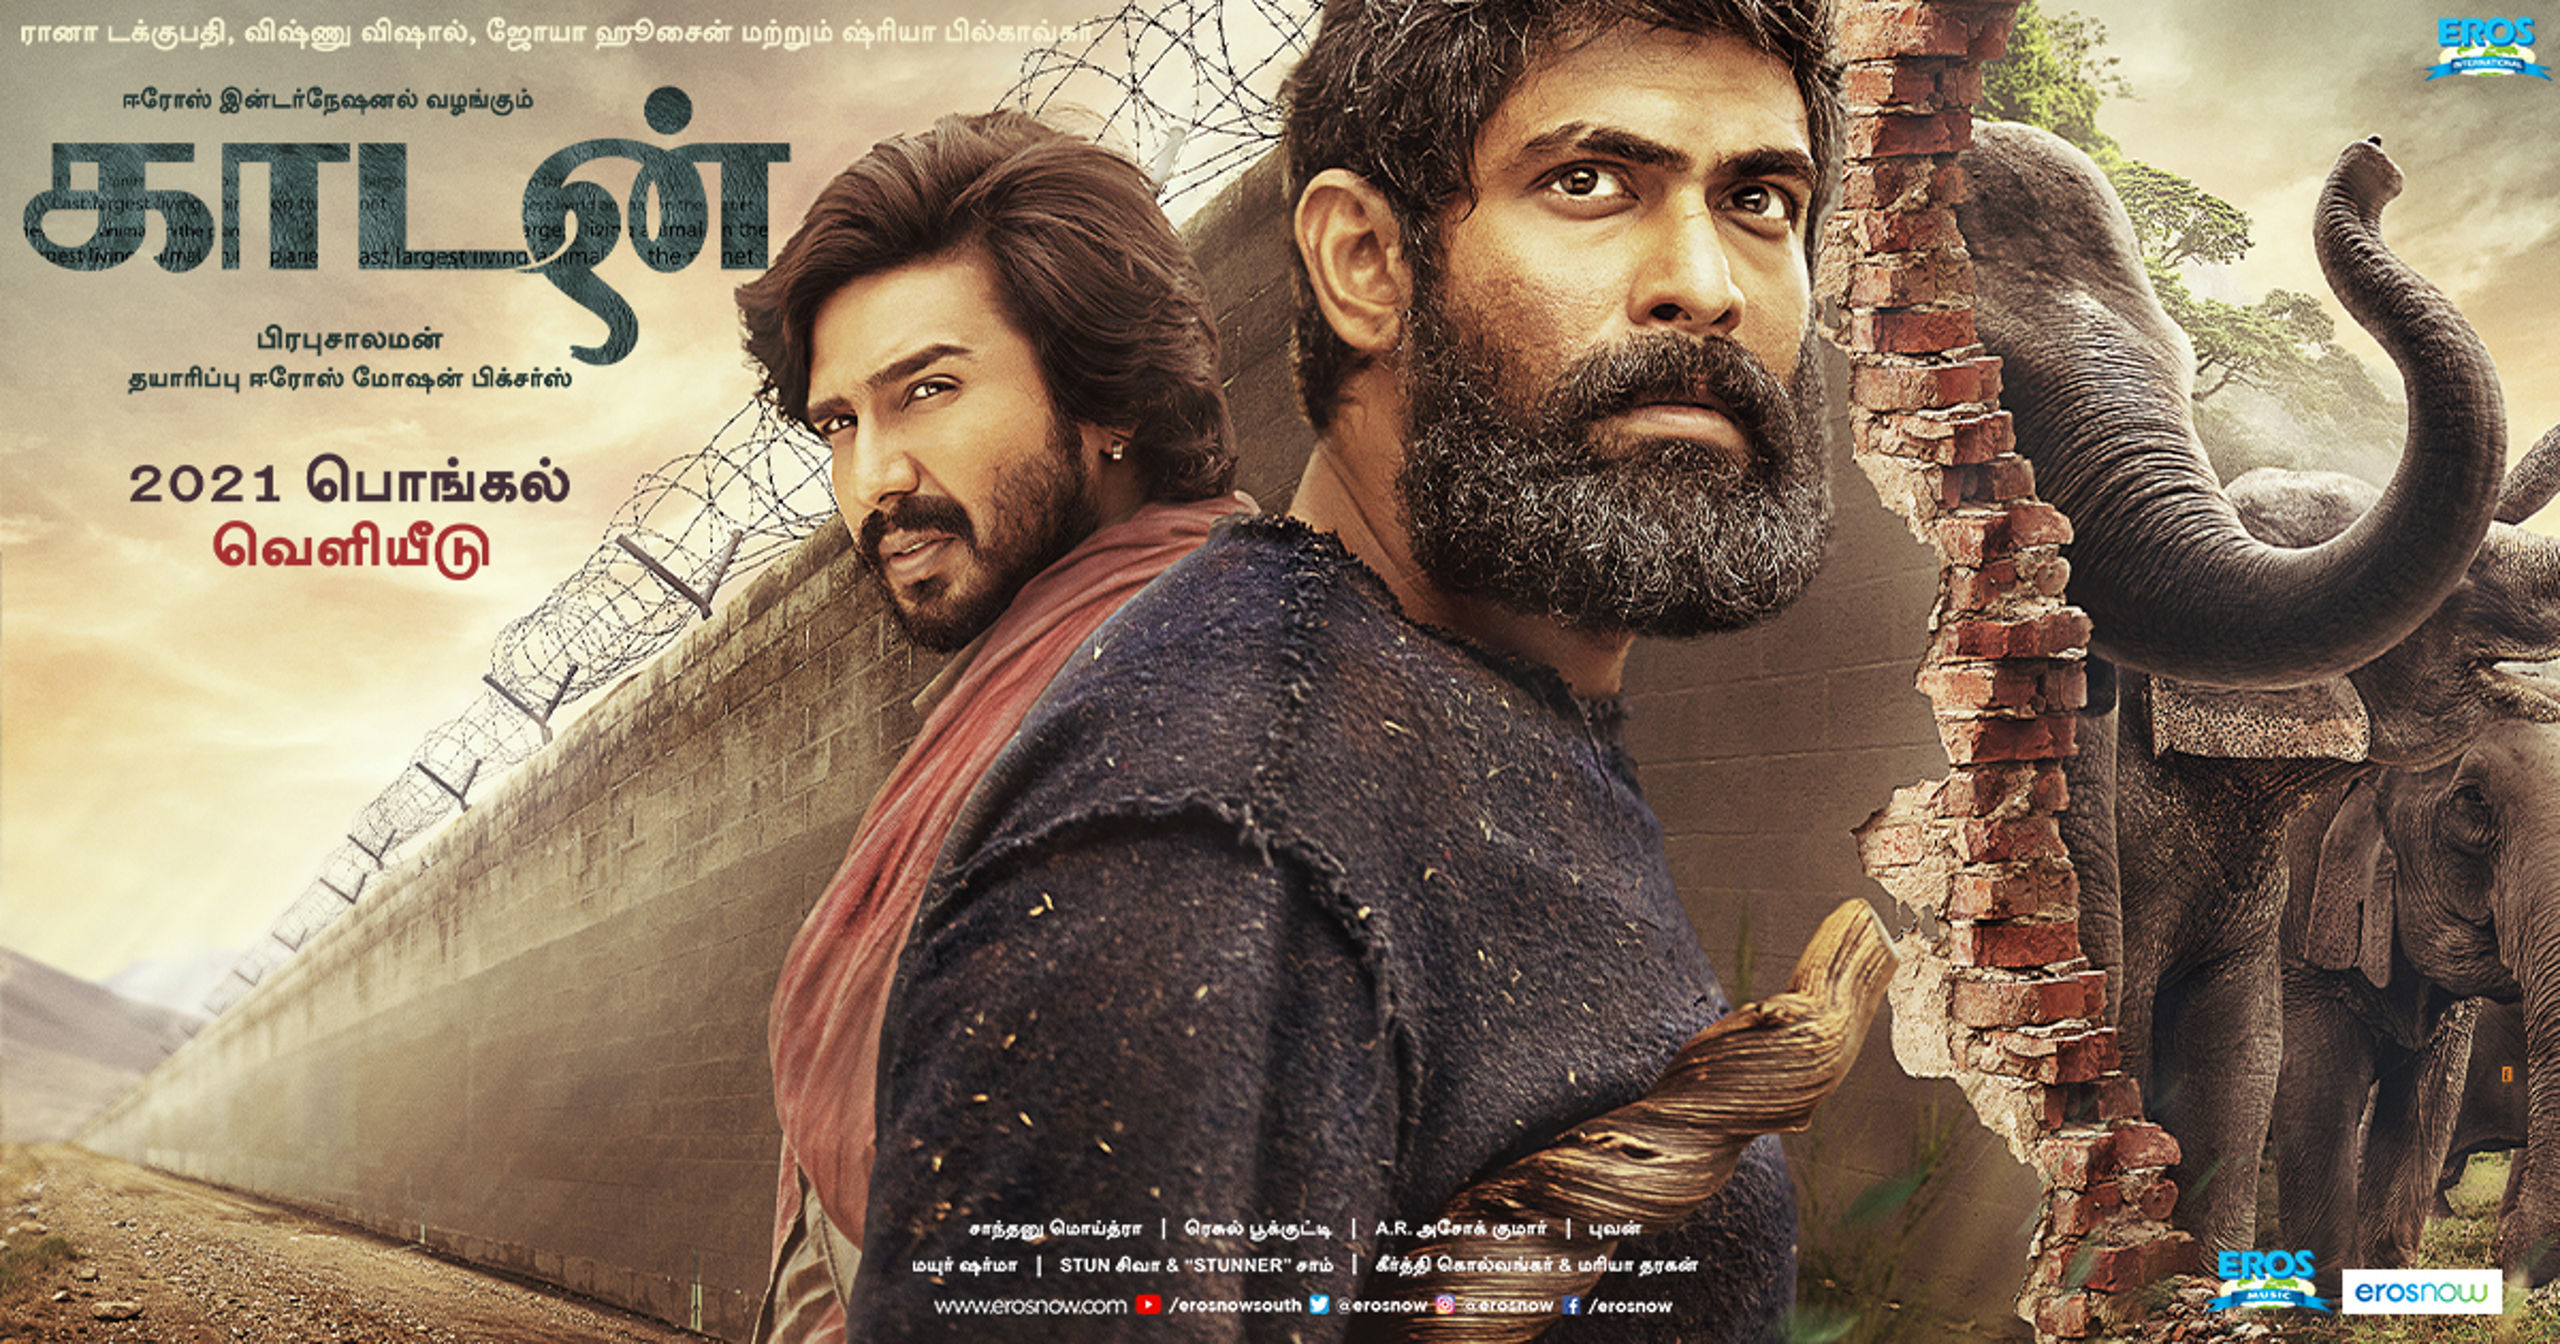 Vishnu Vishal & Rana Daggubati in Kaadan Movie Pongal Release Poster HD